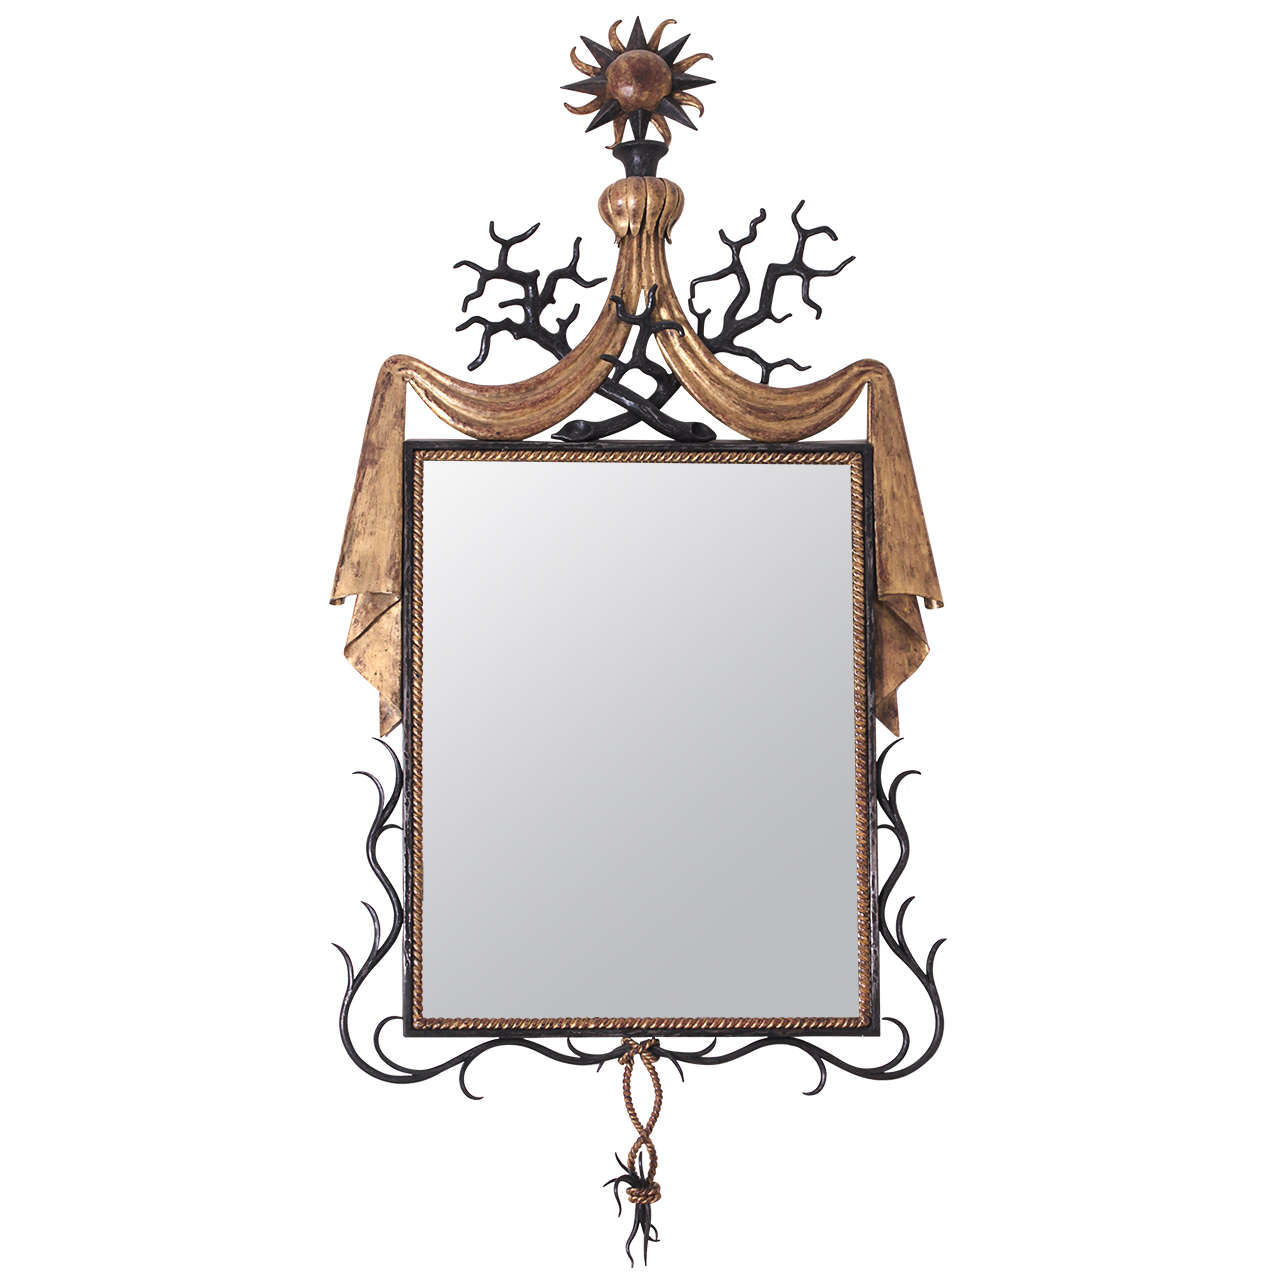 Gilbert poillerat parcel gilt wrought iron mirror french for Wrought iron mirror